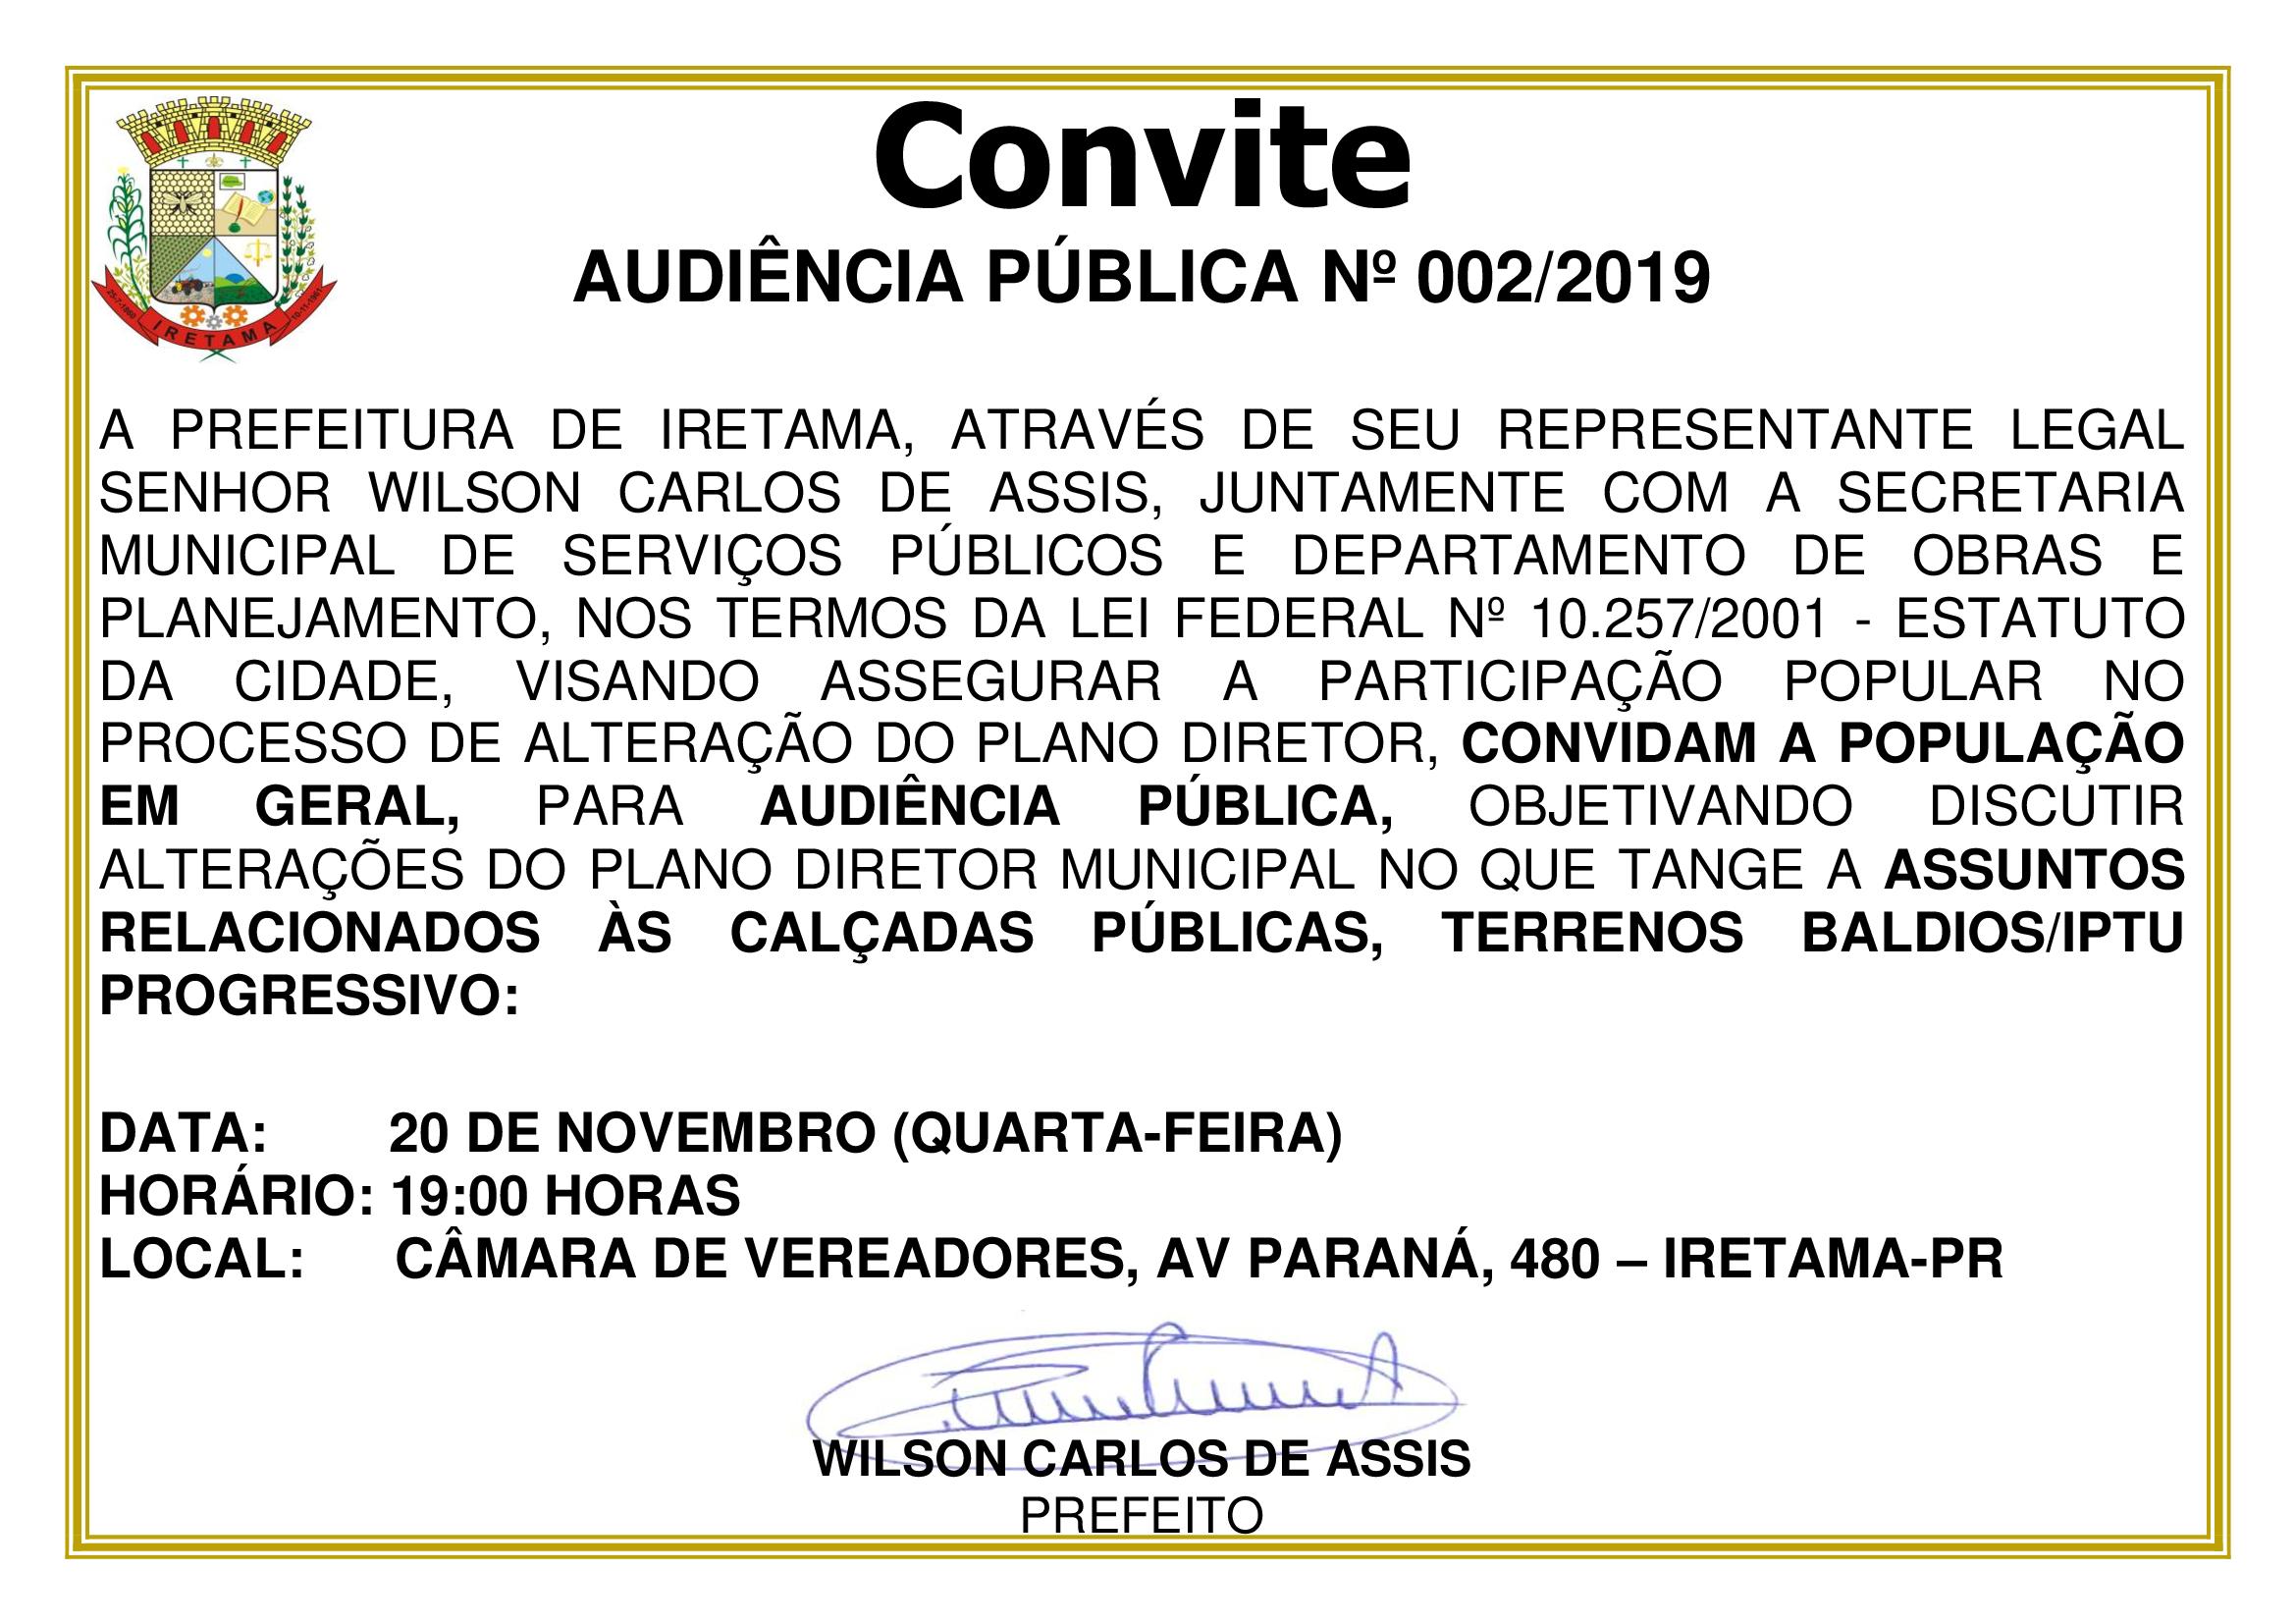 AUDIÊNCIA PÚBLICA Nº 002/2019